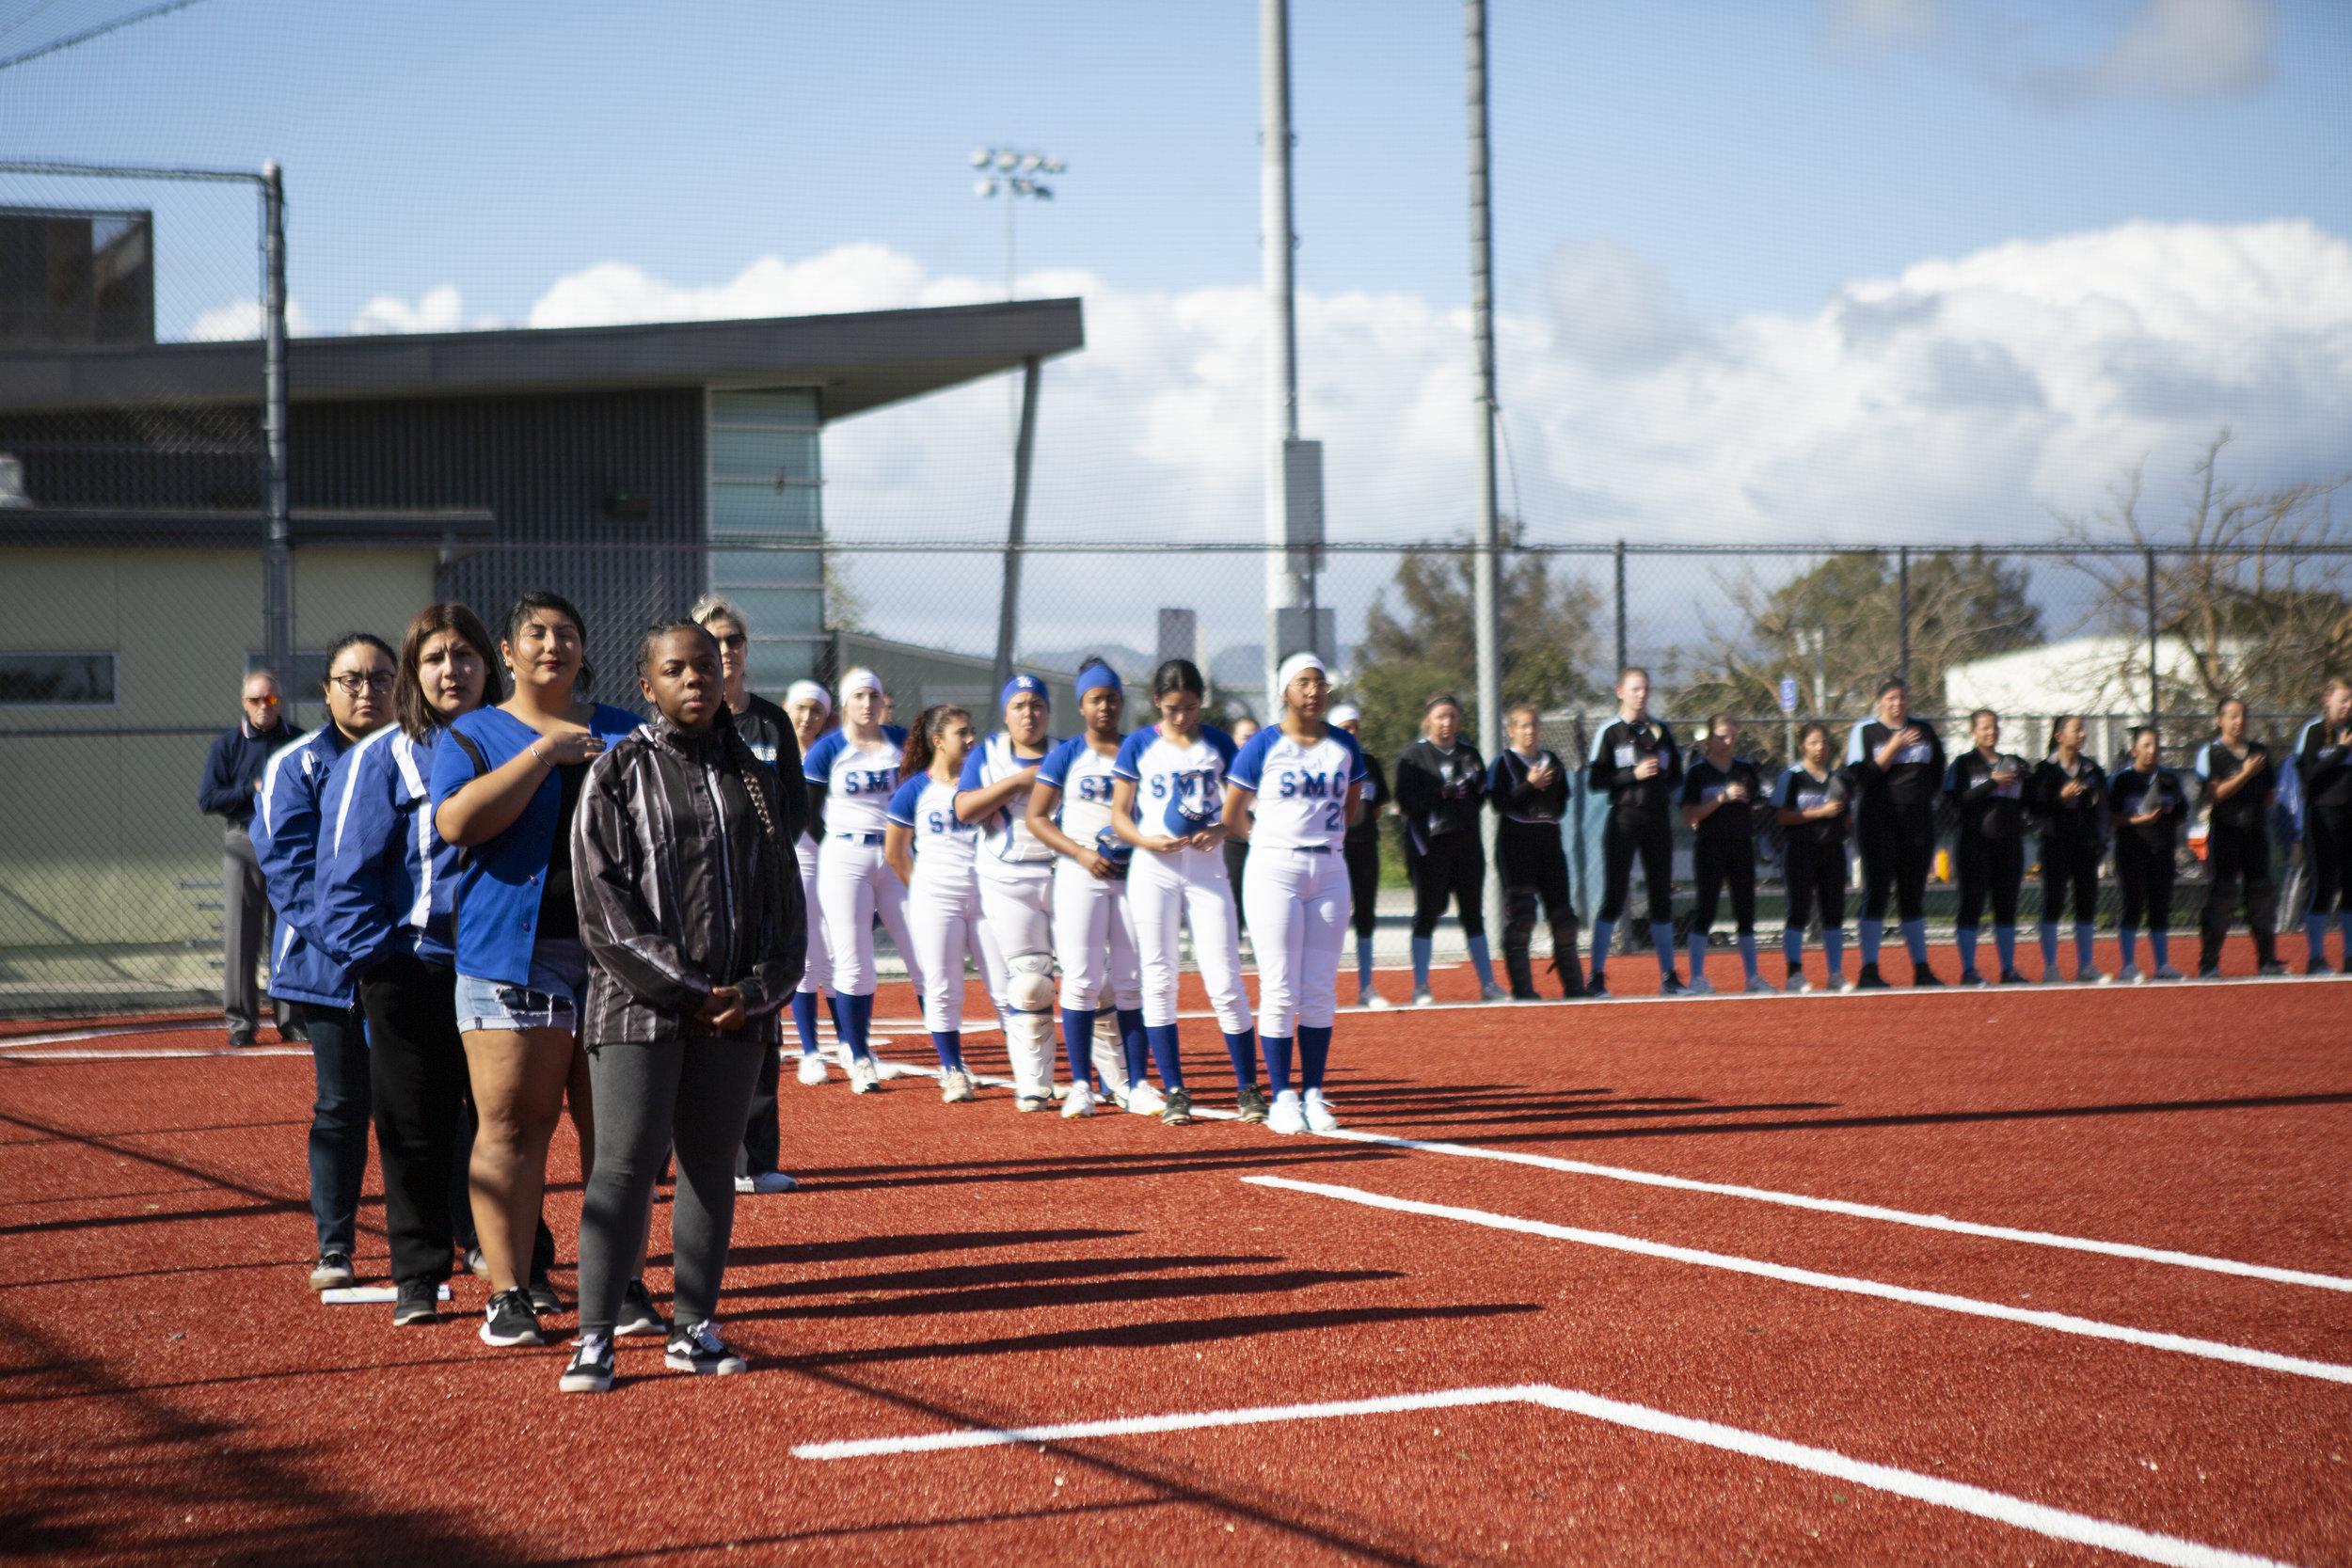 Santa Monica College softball team playing at home vs Moorpark team, Thursday, March 7, 2019 in Santa Monica, Calif.